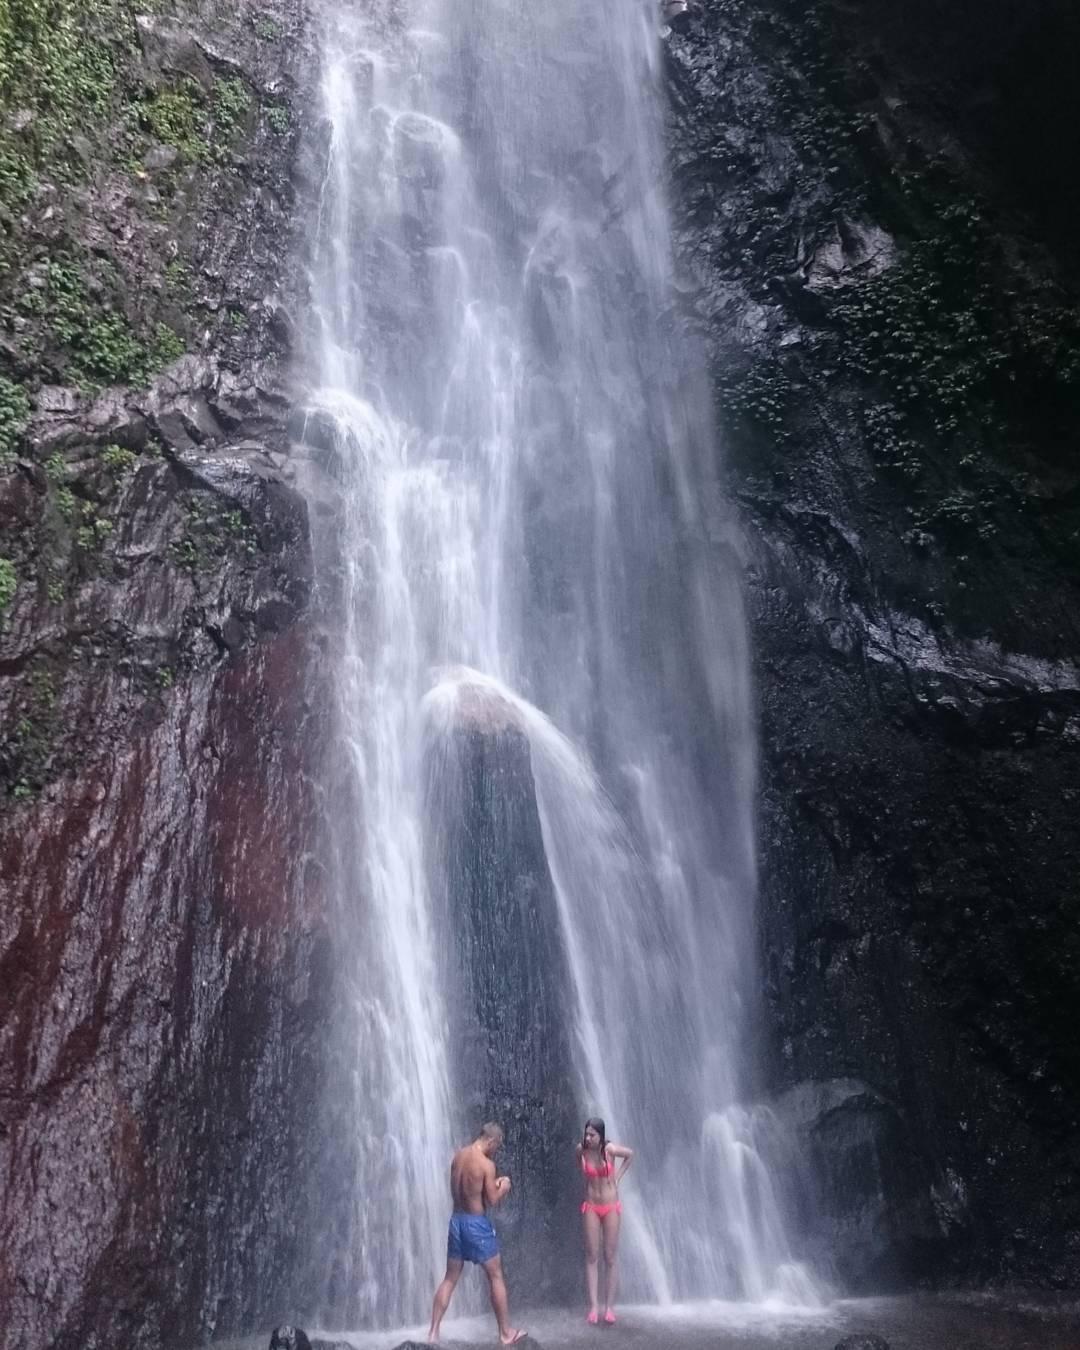 Yeh Mampeh Waterfall - Bali Holiday Secrets